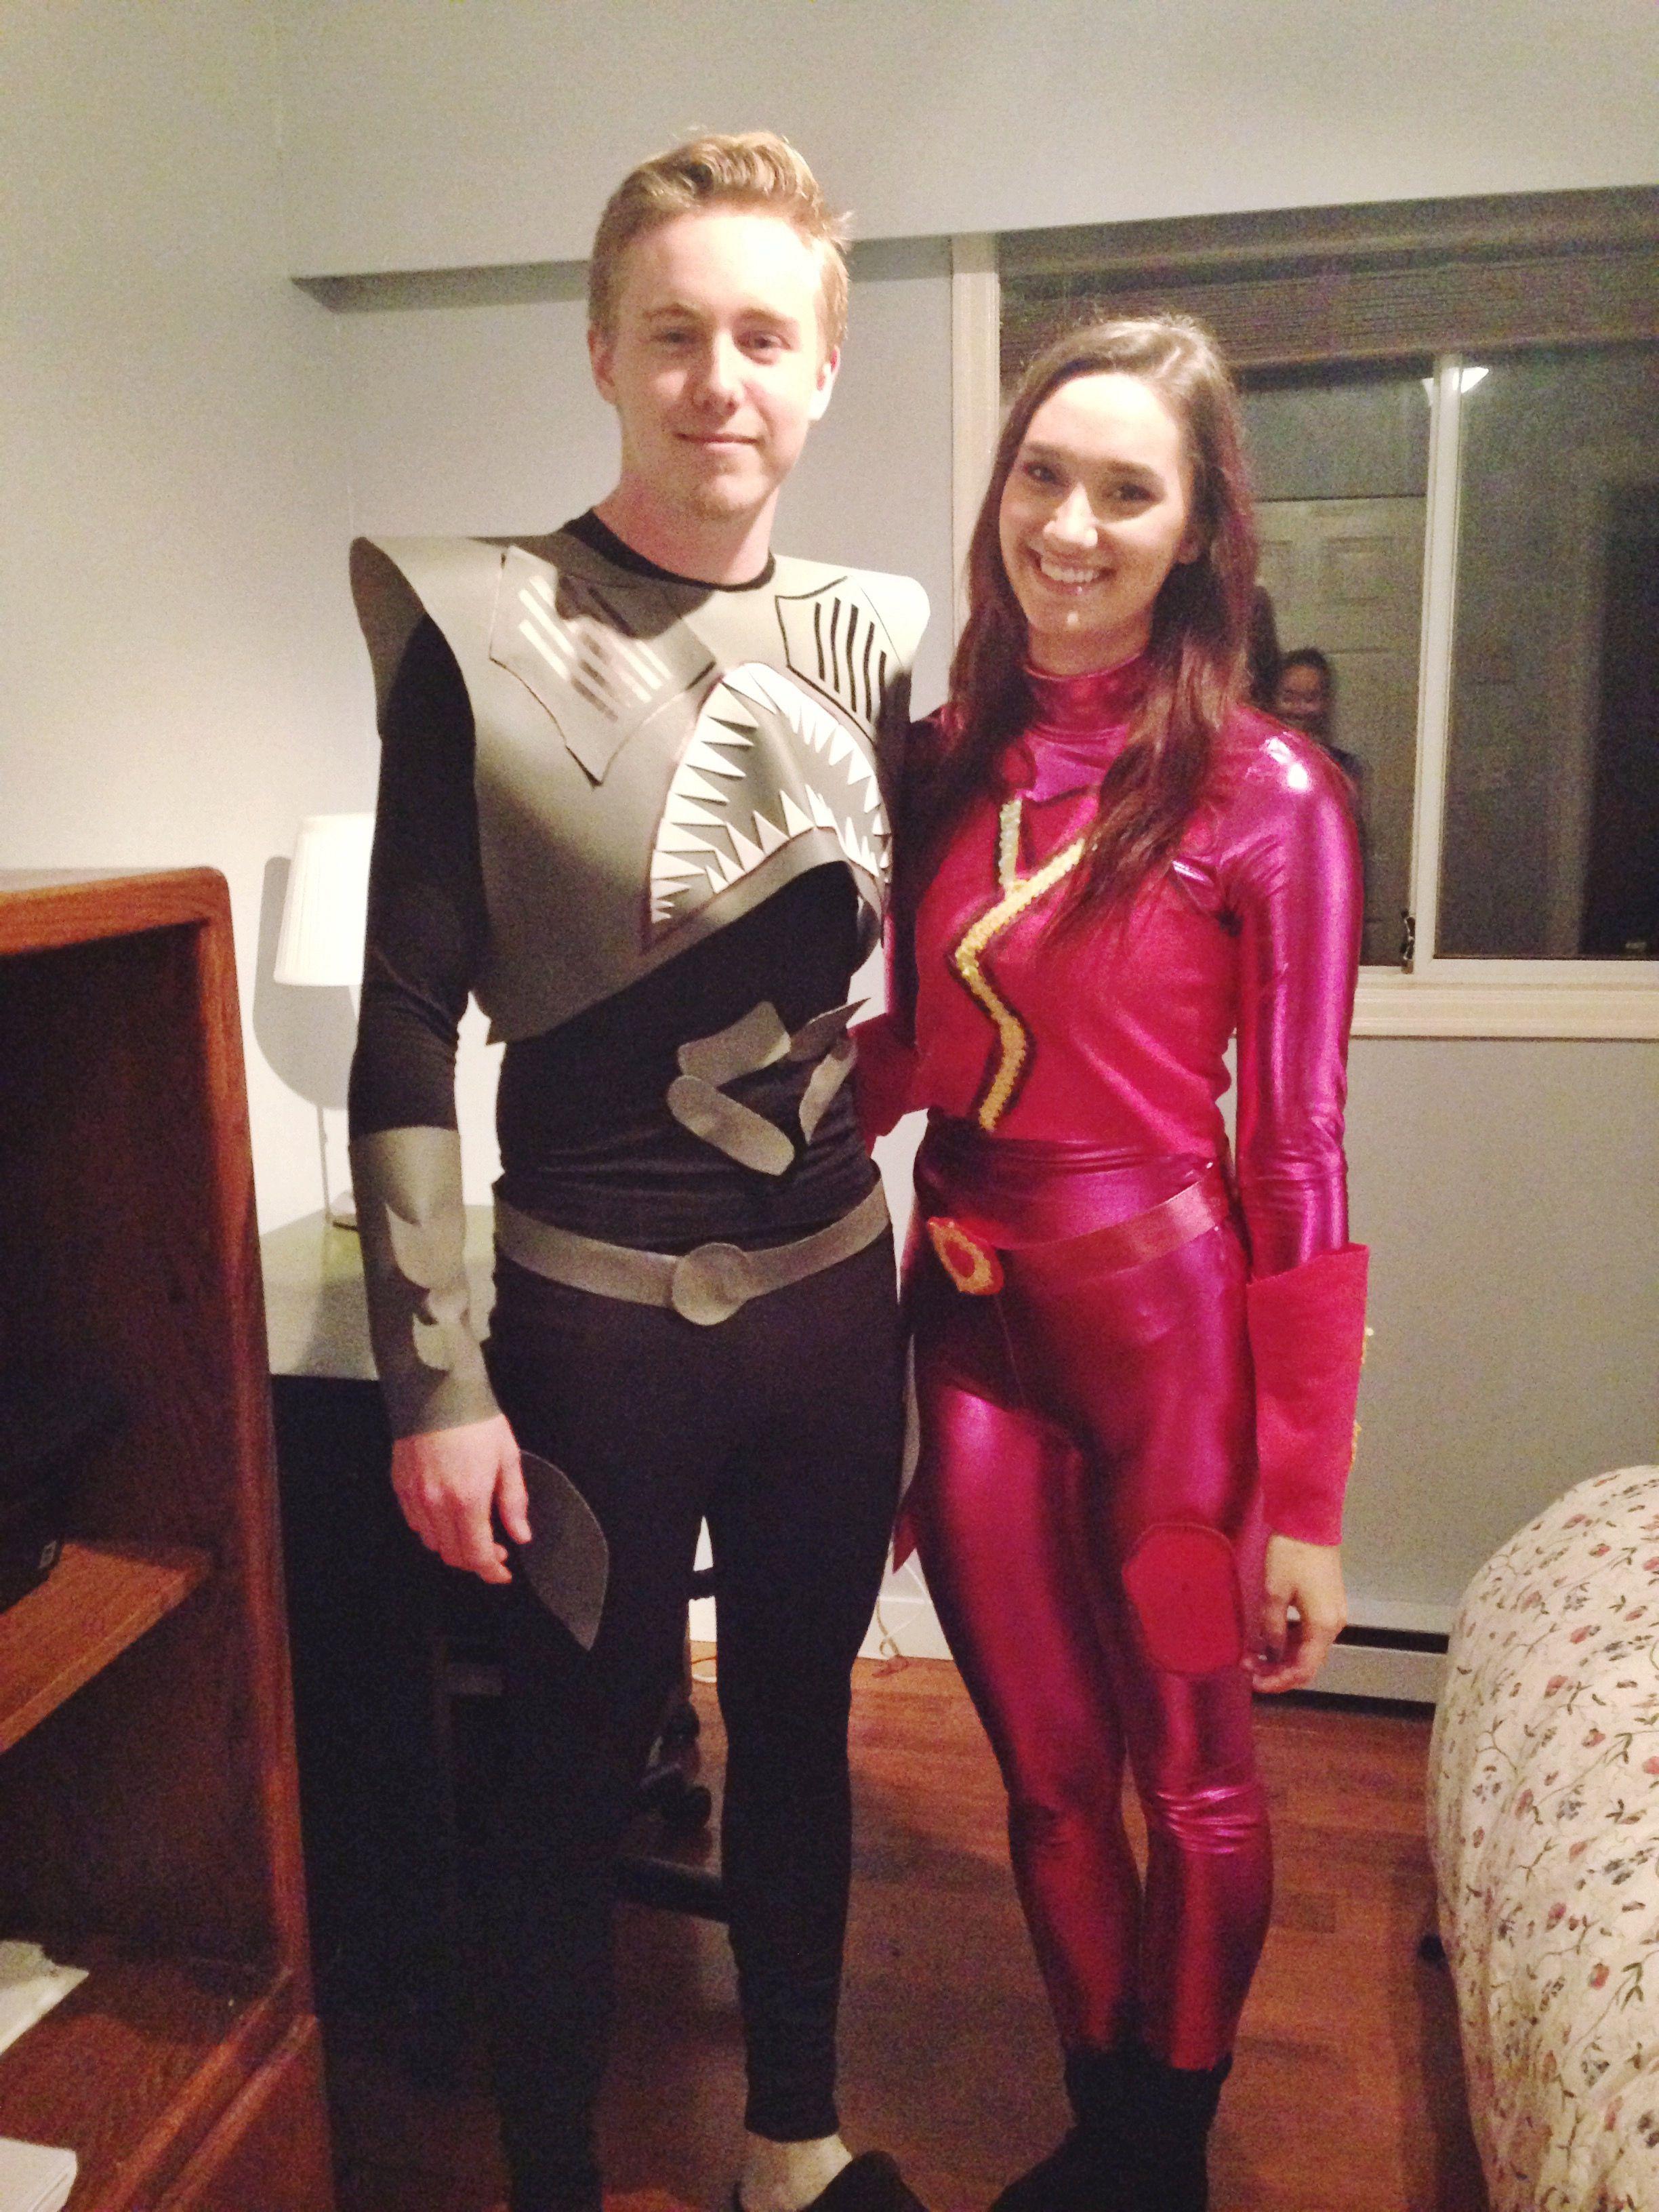 Sharkboy and Lavagirl costume Halloween costume. Couples costume ...